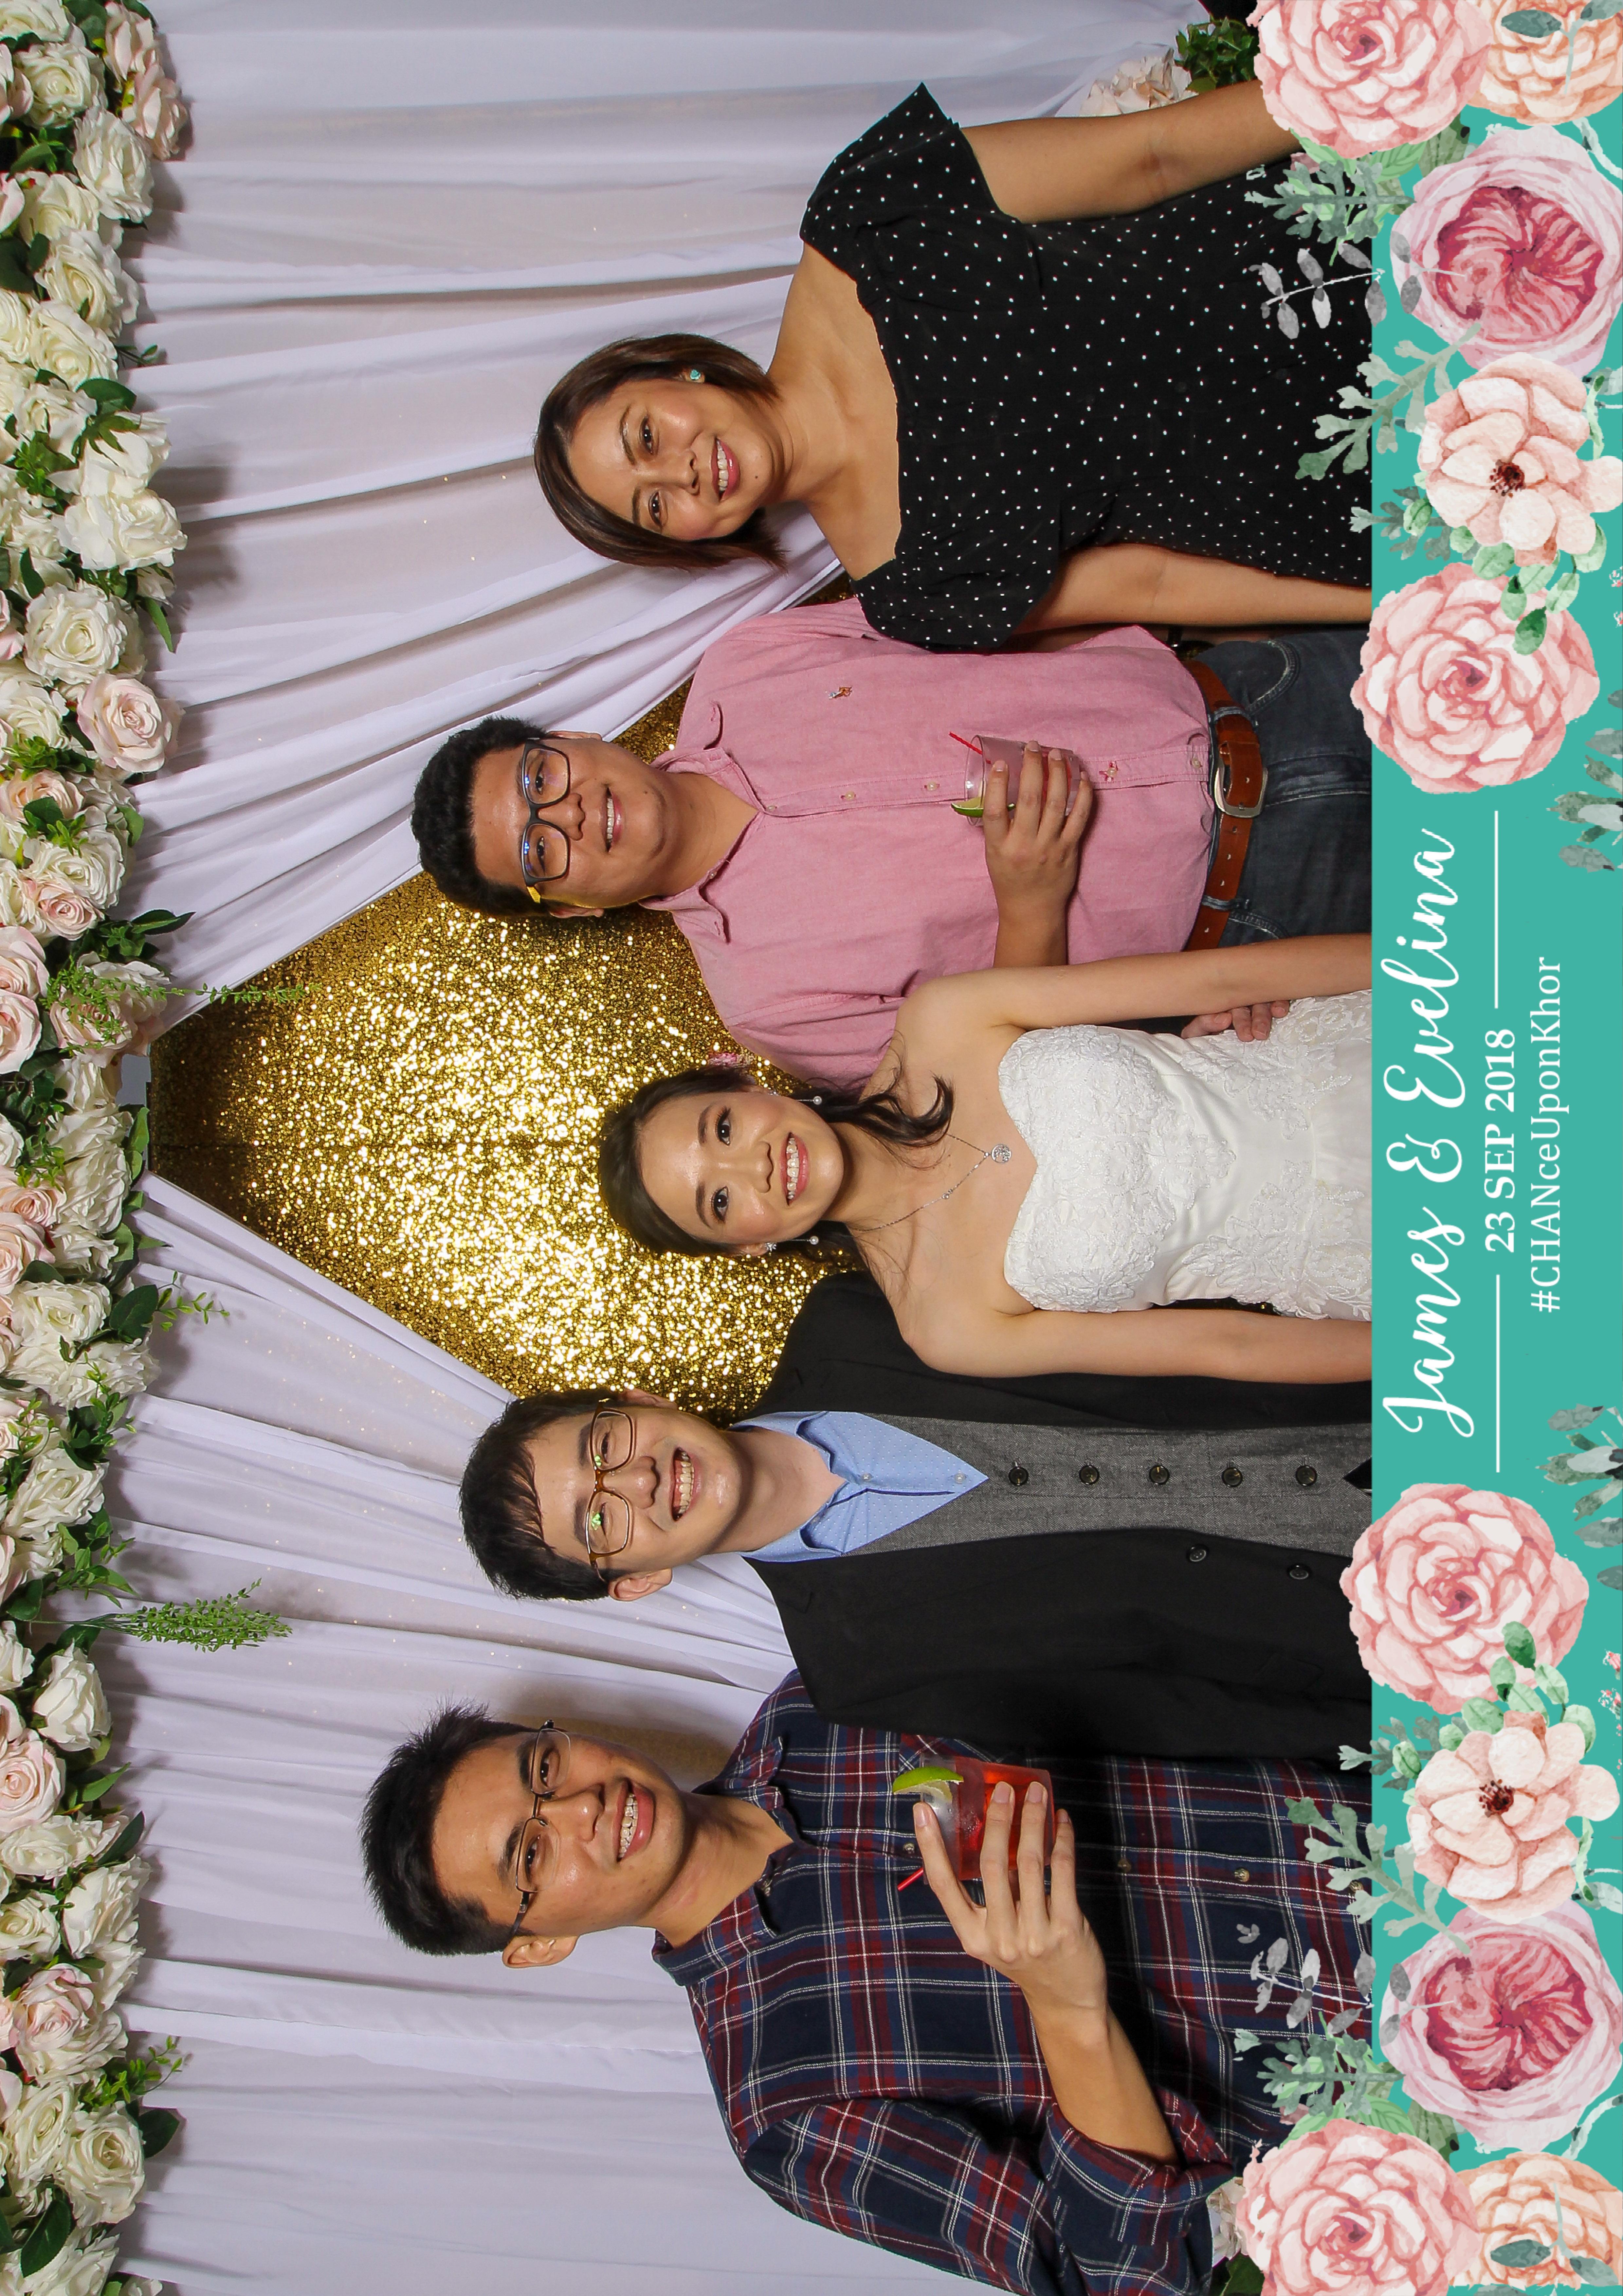 wedding photo booth singapore-13